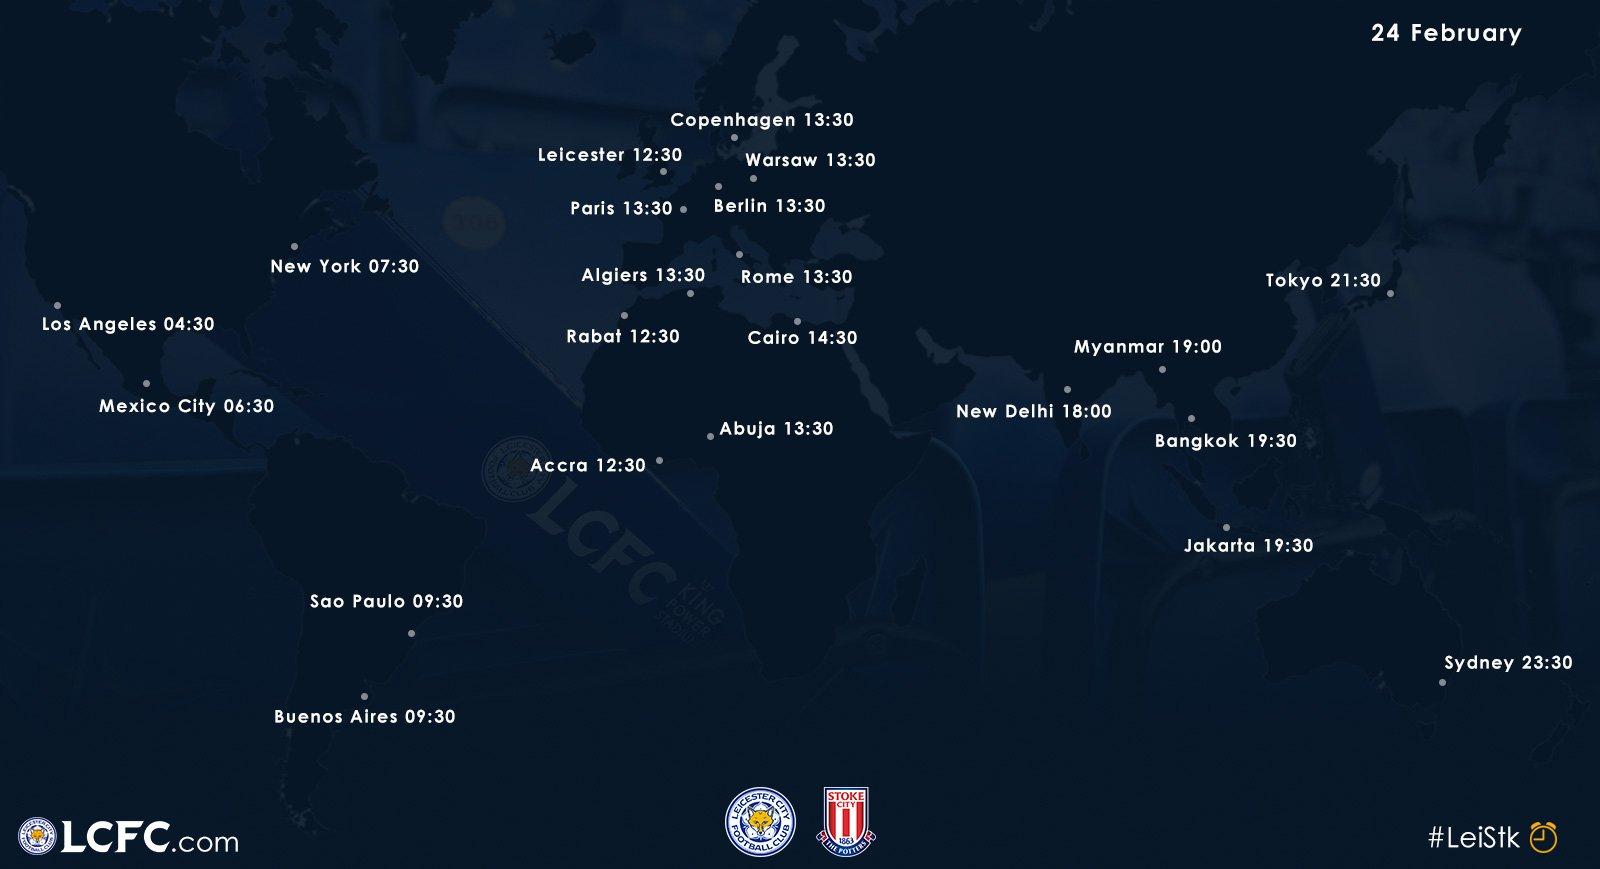 Kick-off times around the �� for #LeiStk...  Global broadcast schedules ➡️ https://t.co/lSCShyS6qz https://t.co/ffPNkutaKi